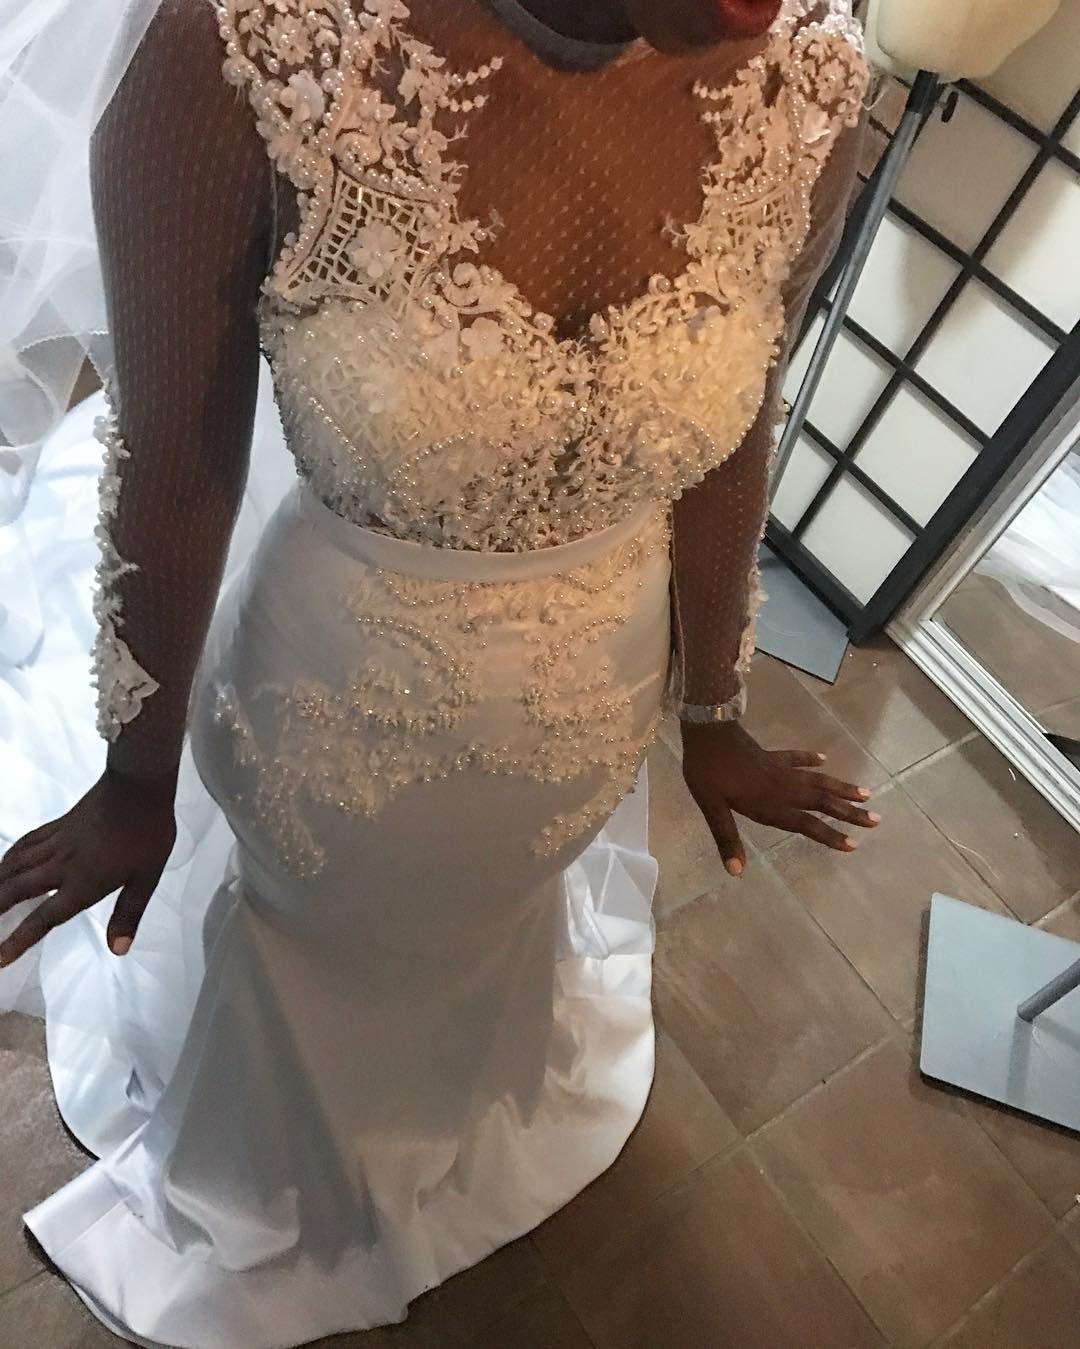 Orapeleng Modutle Wedding Dress Prices 62 Off Awi Com,Macy Dresses For Weddings